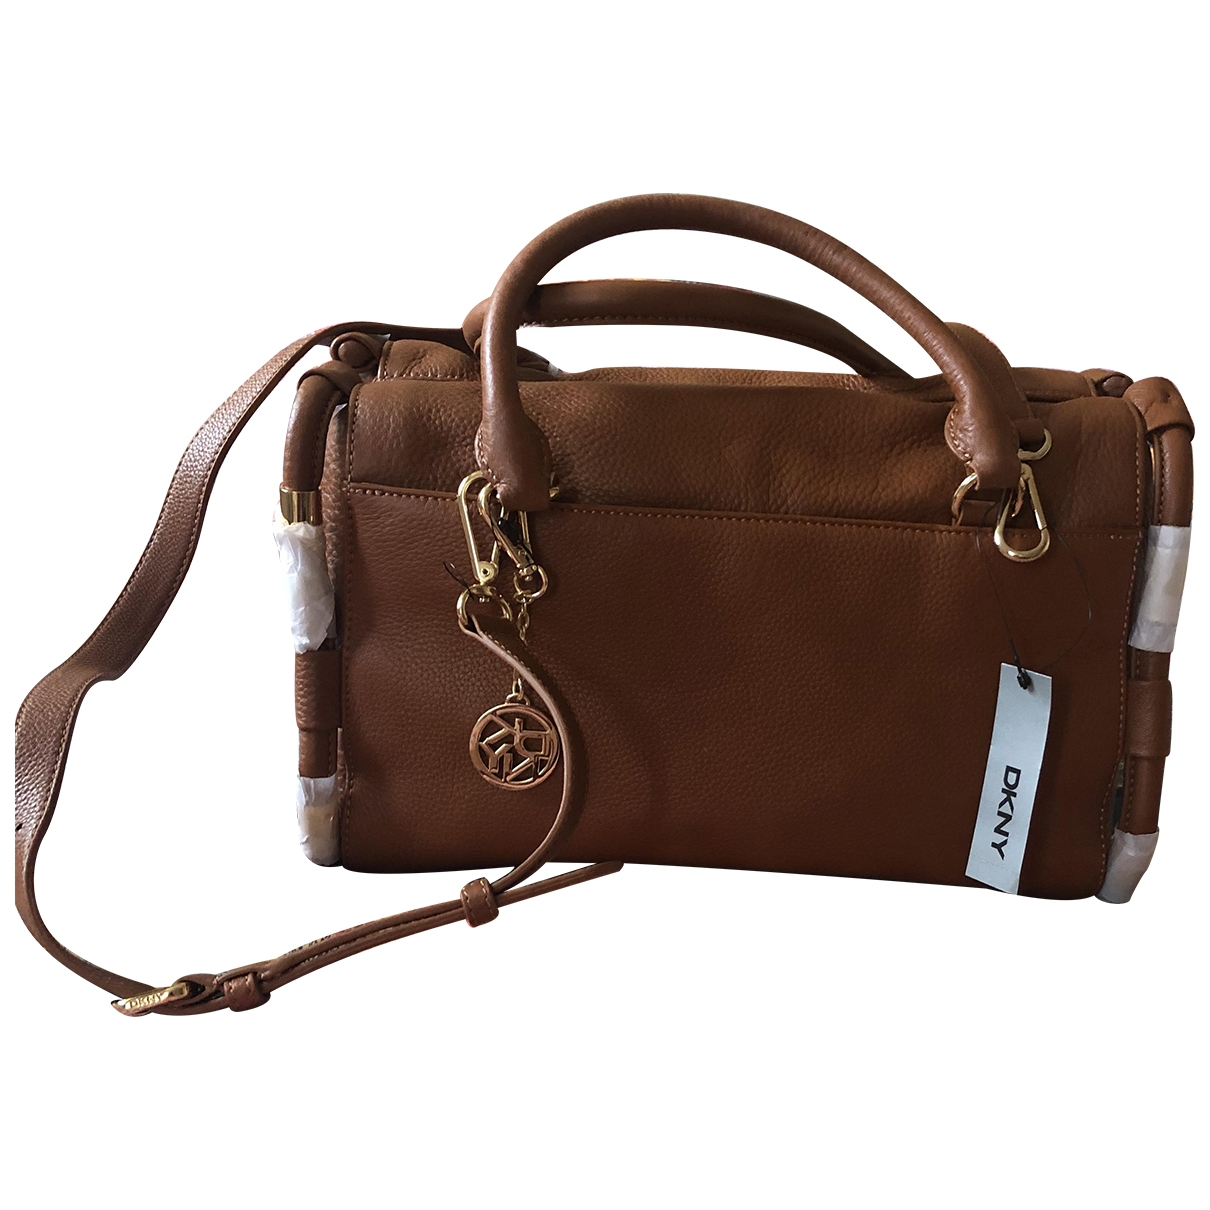 Dkny \N Camel Leather handbag for Women \N